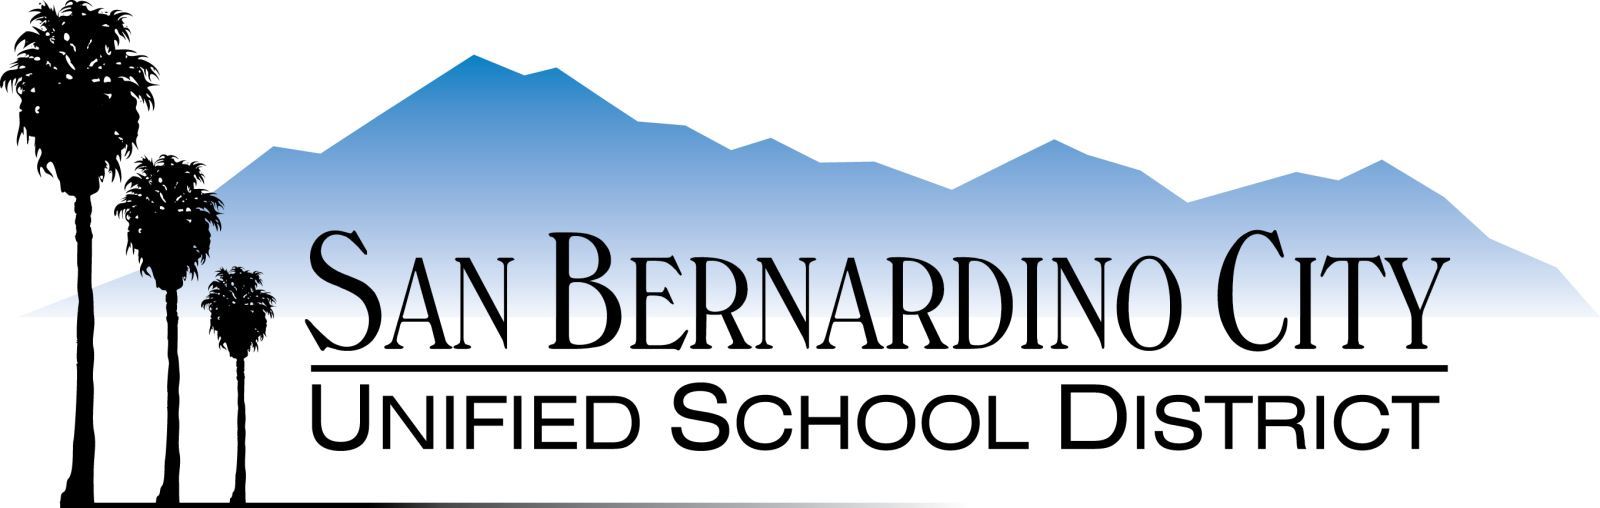 San Bernardino City Unified School District logo